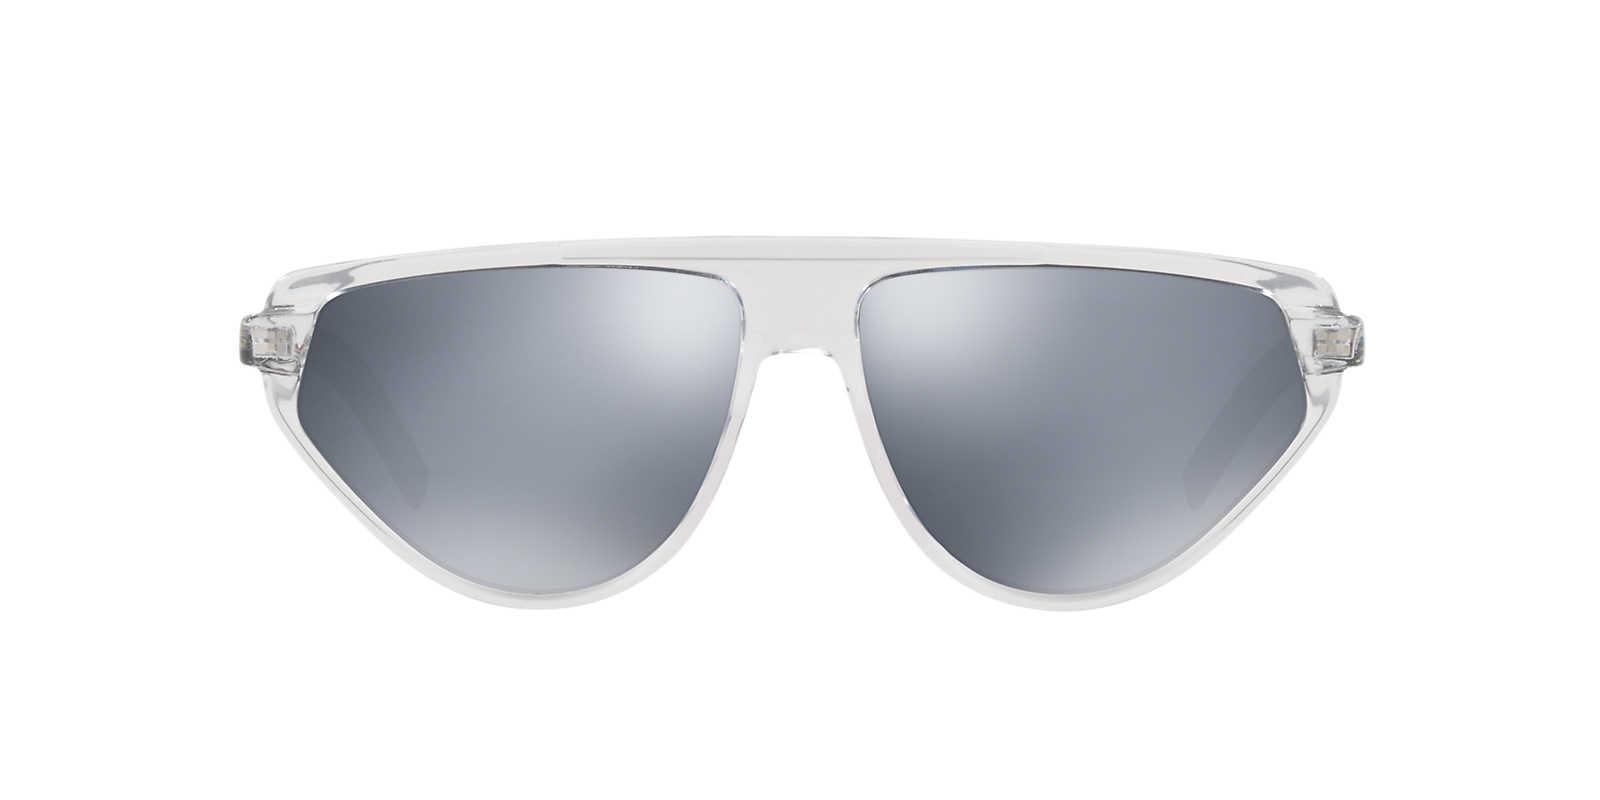 29b36b26f836d Dior Sunglass Blacktie247s 60 in Metallic for Men - Lyst